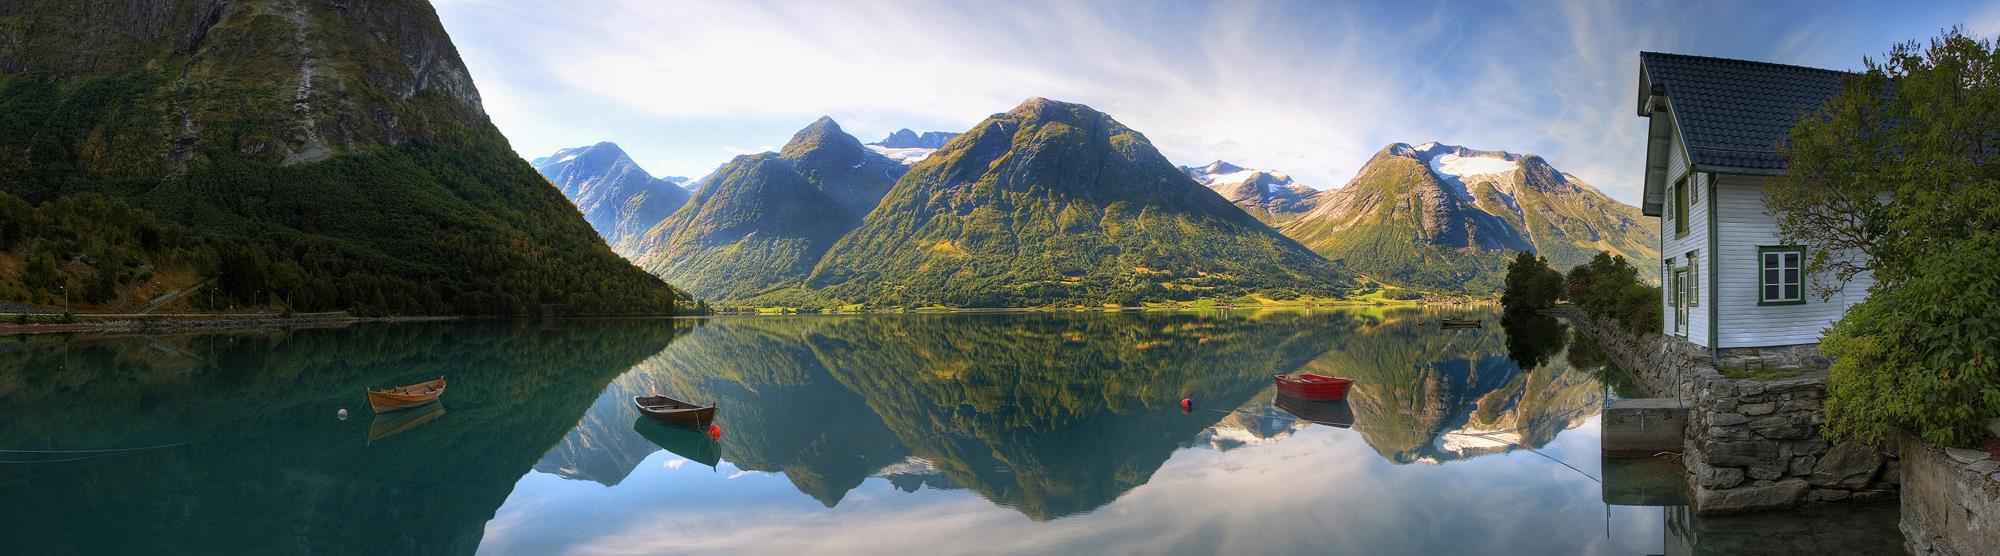 Das Tor zu den Fjorden Norwegens